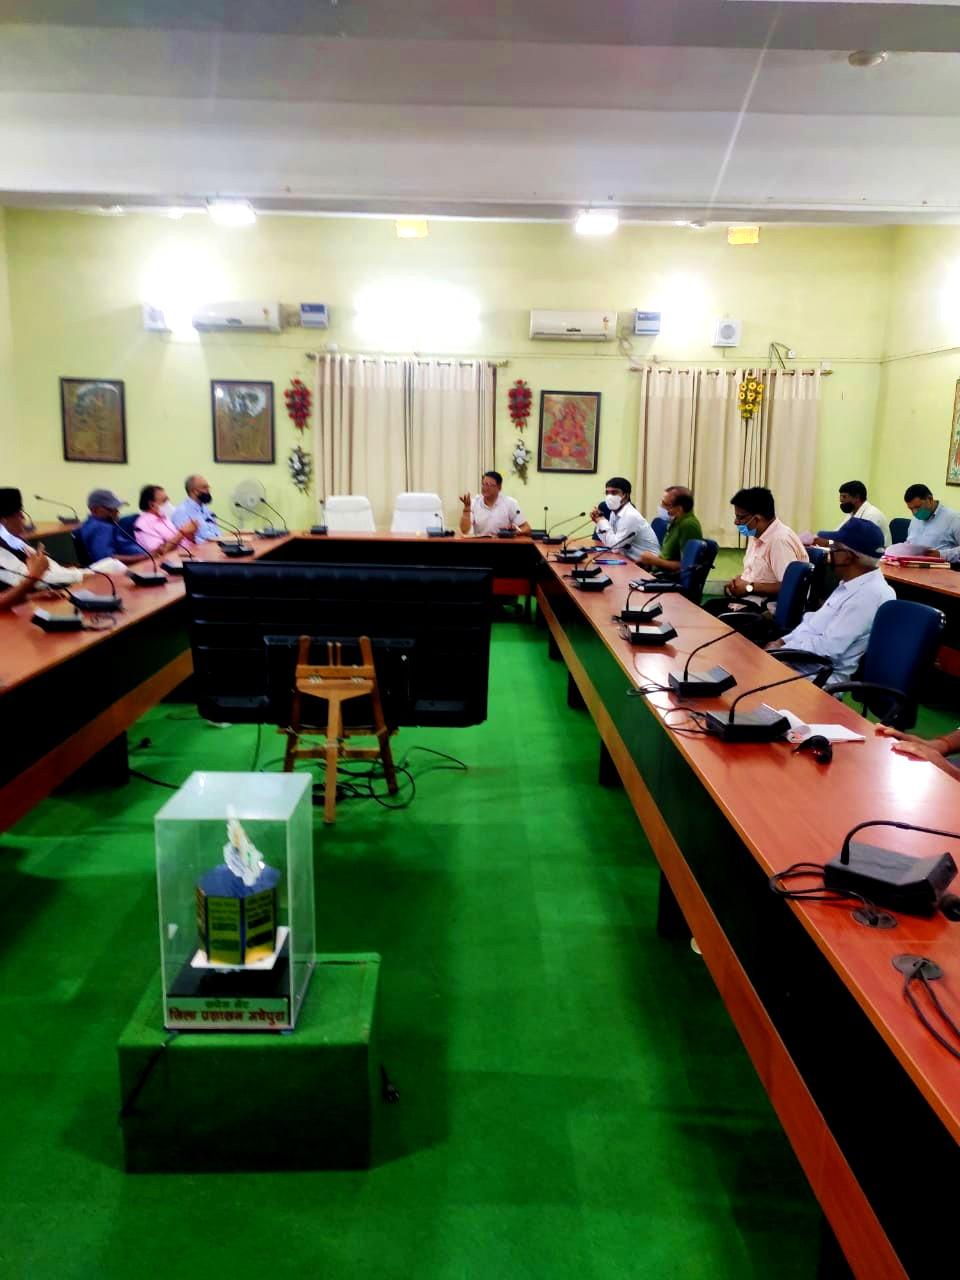 Samajsevi Dr.Bhupendra Madhepuri along with Dr.A.K.Mandal, Senior Deputy Collector Birju Das, Executive Officer Praveen Kumar and others taking part in the preparatory Samaroh of B.P.Mandal Jayanti under the presidentship of ADM Upendra Kumar at Jhallu Babu Sabhagar, Madhepura.